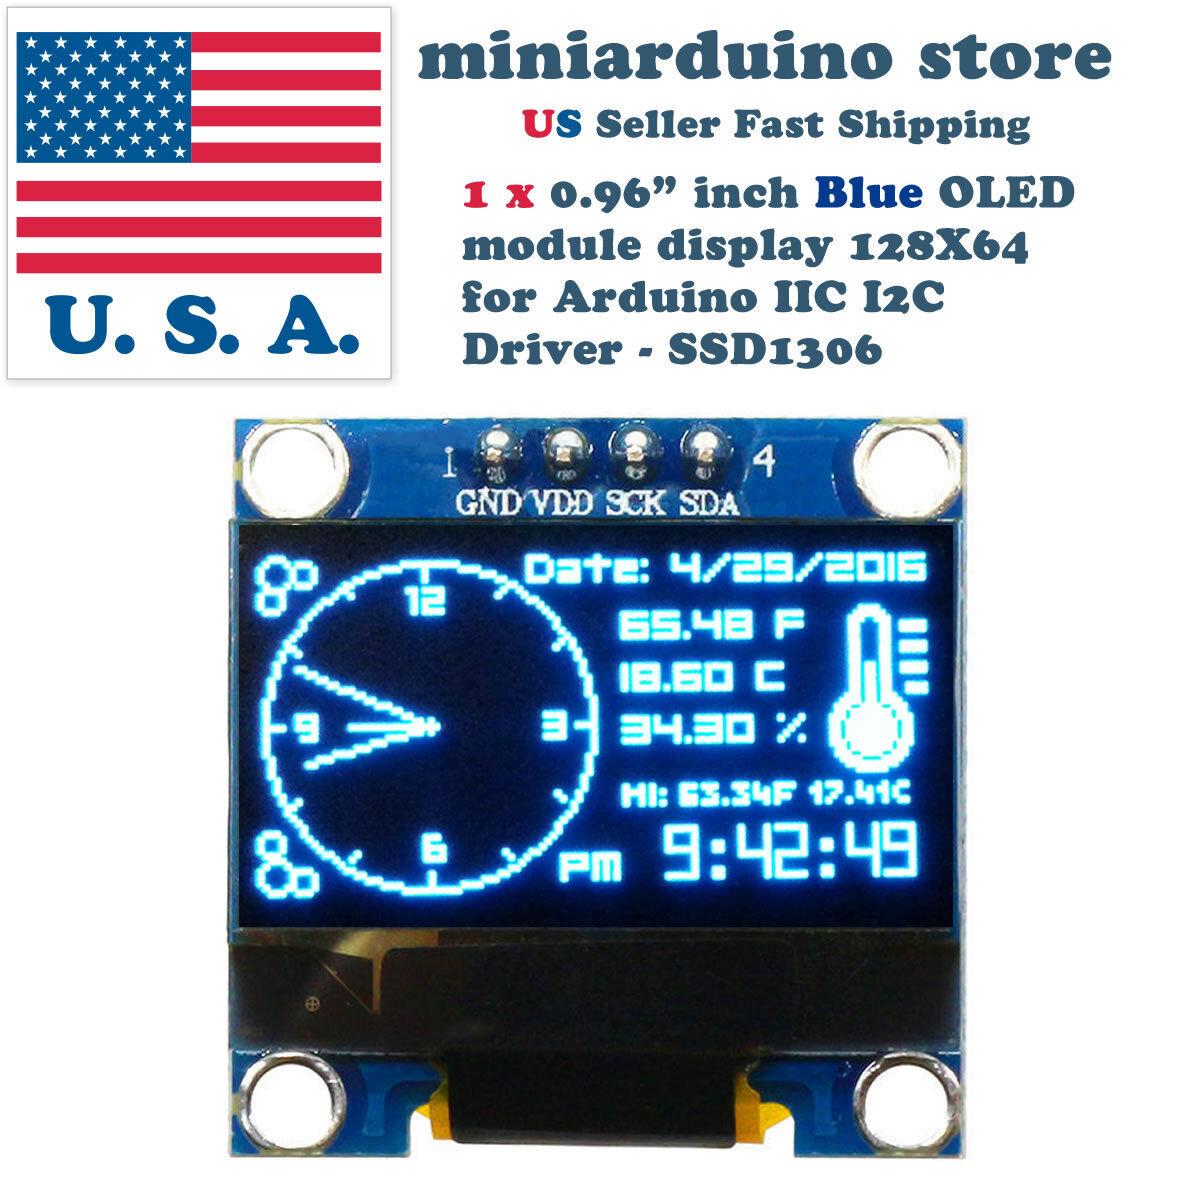 HiLetgo 0.96 I2C IIC Serial 128X64 OLED LCD Display 4 Pin Font Color Blue